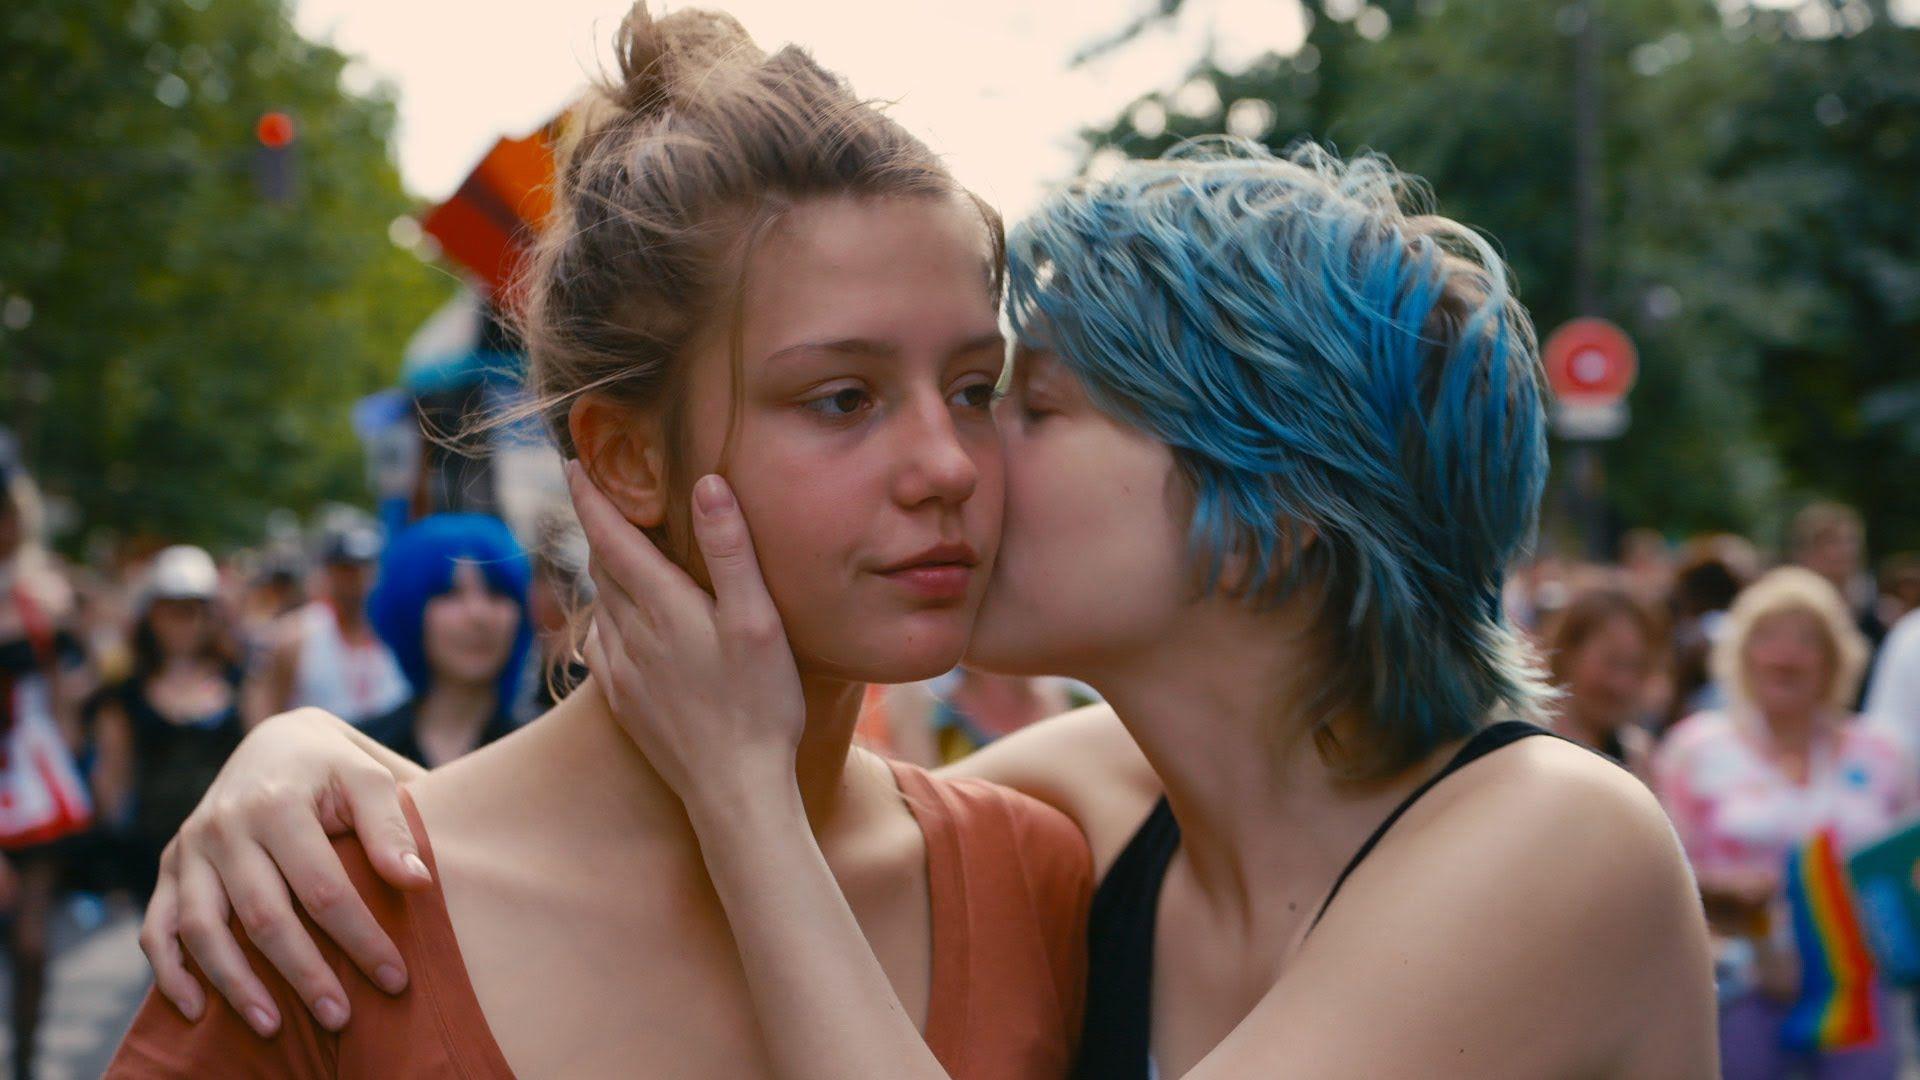 Lesbian pop culture web sites